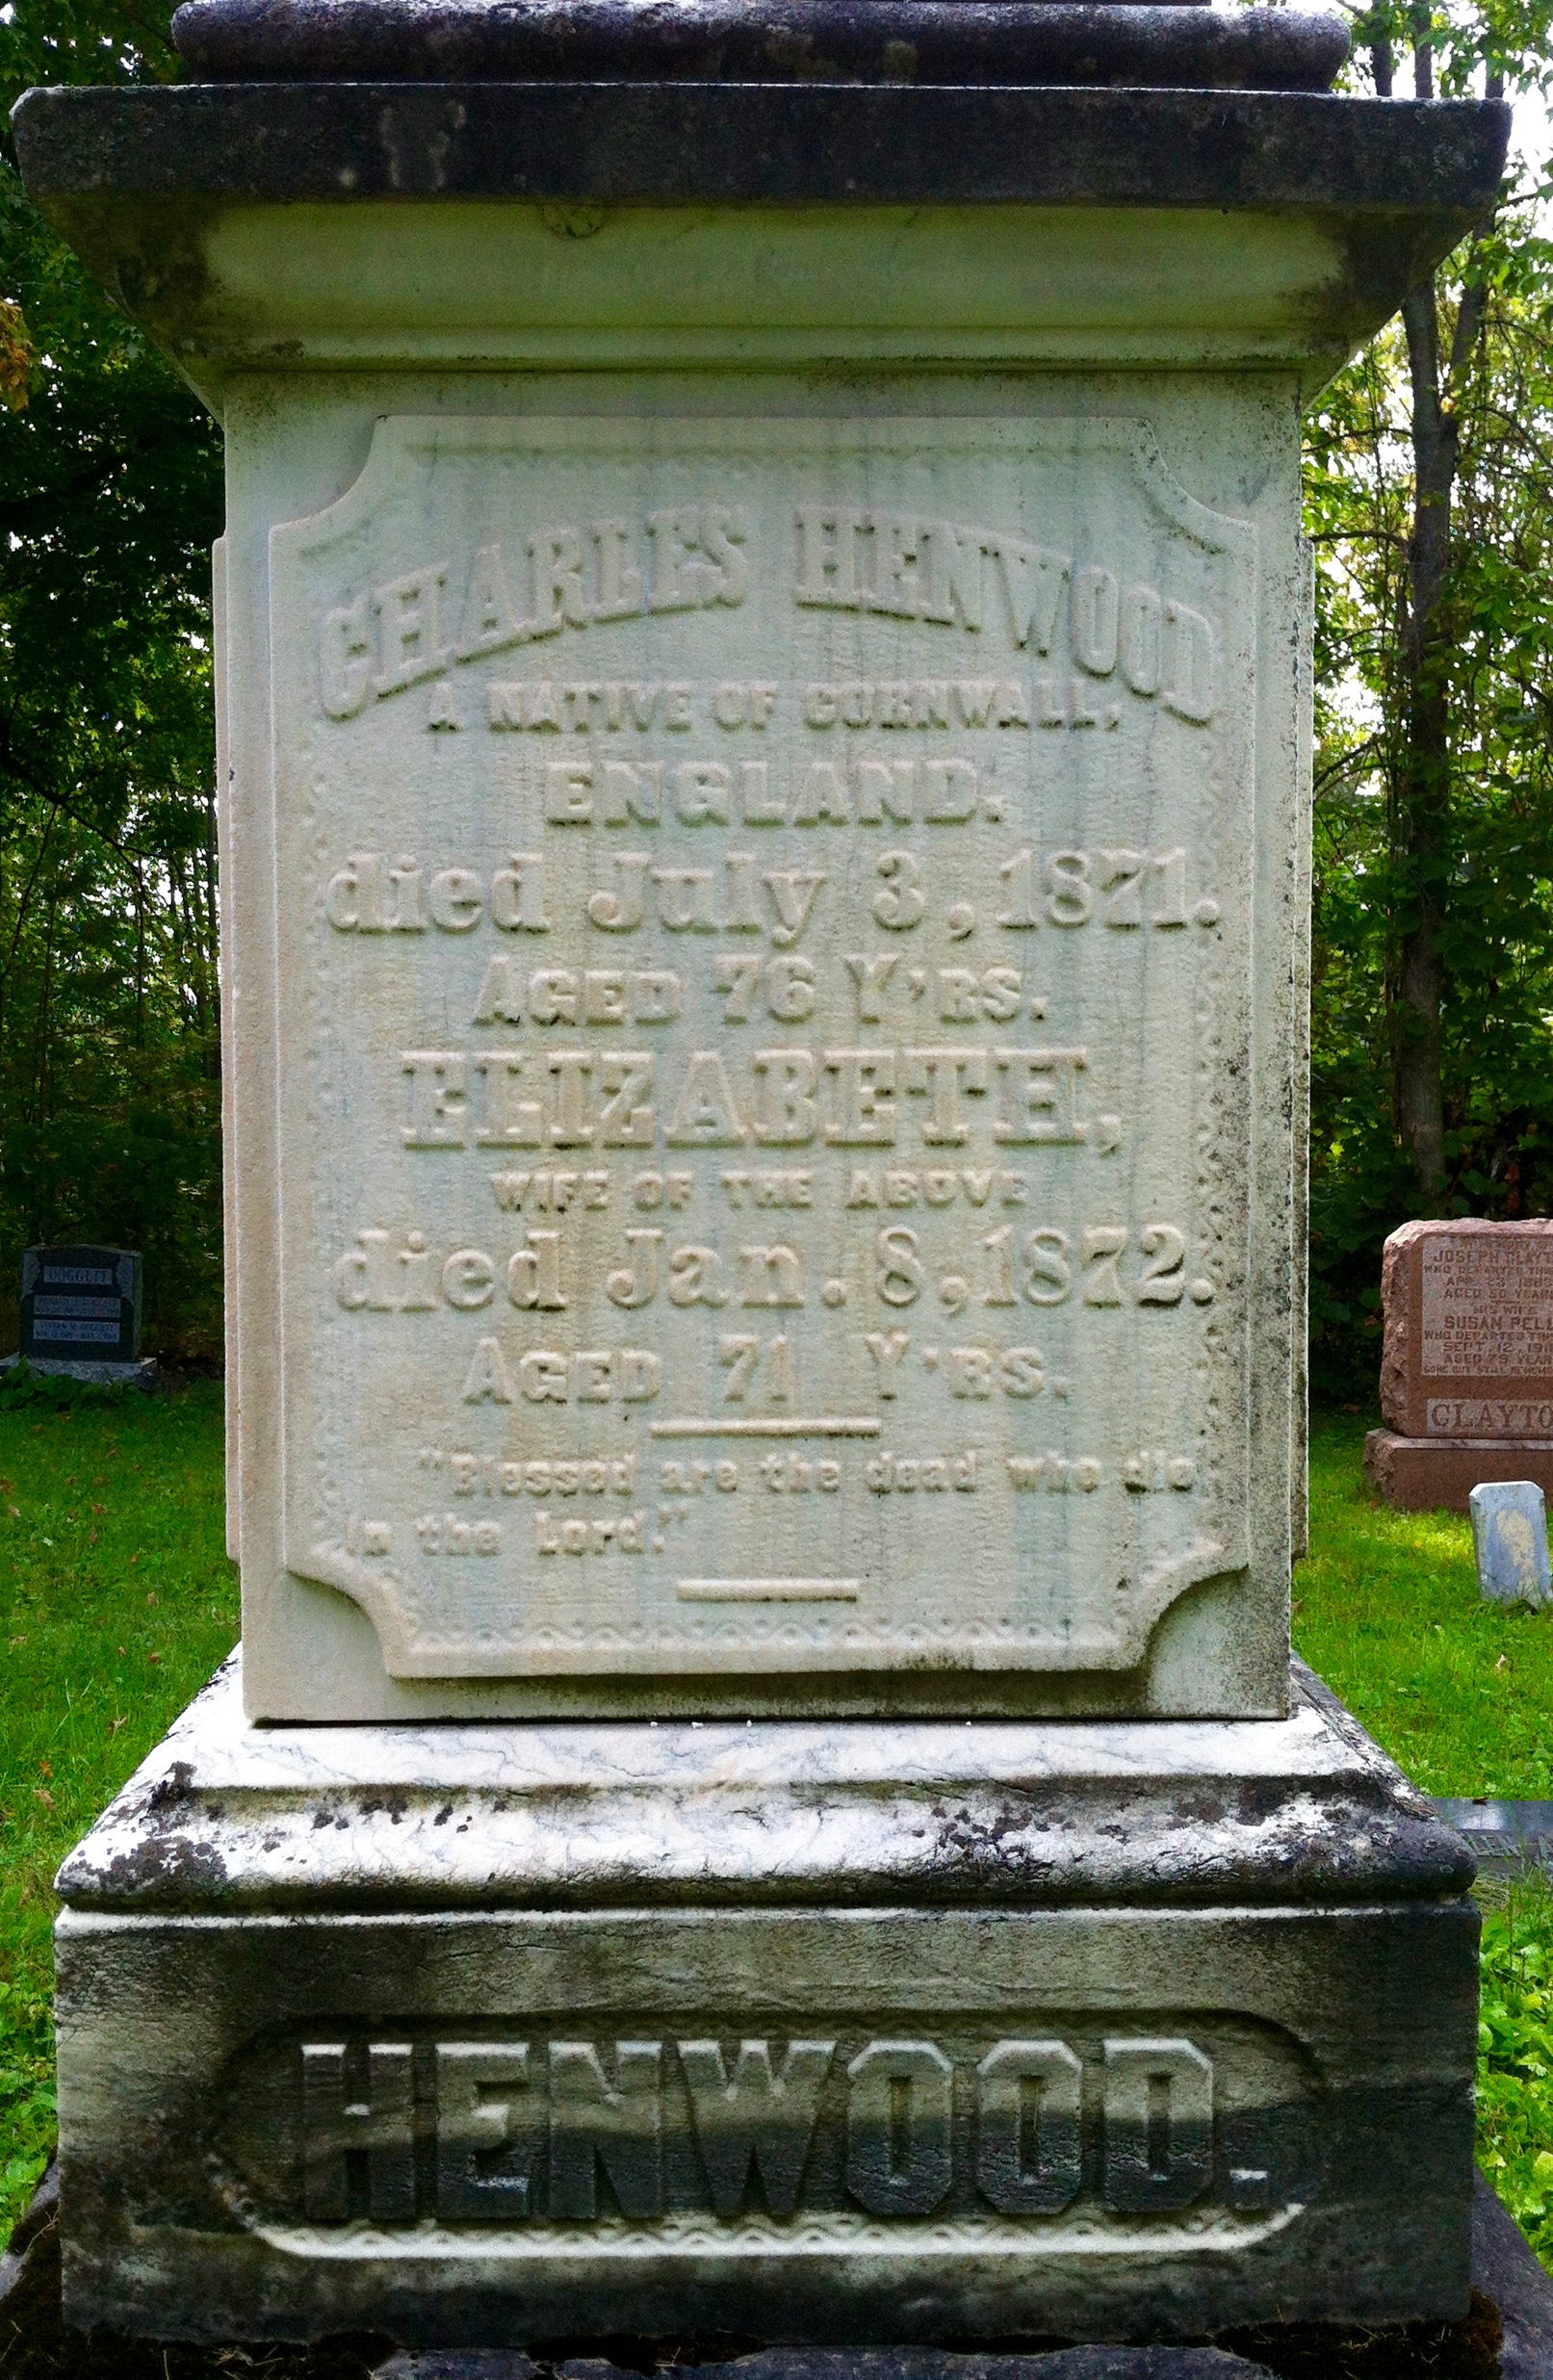 Tombstone at Canton Cemetery - Elizabeth Trick Henwood (1801-1872)